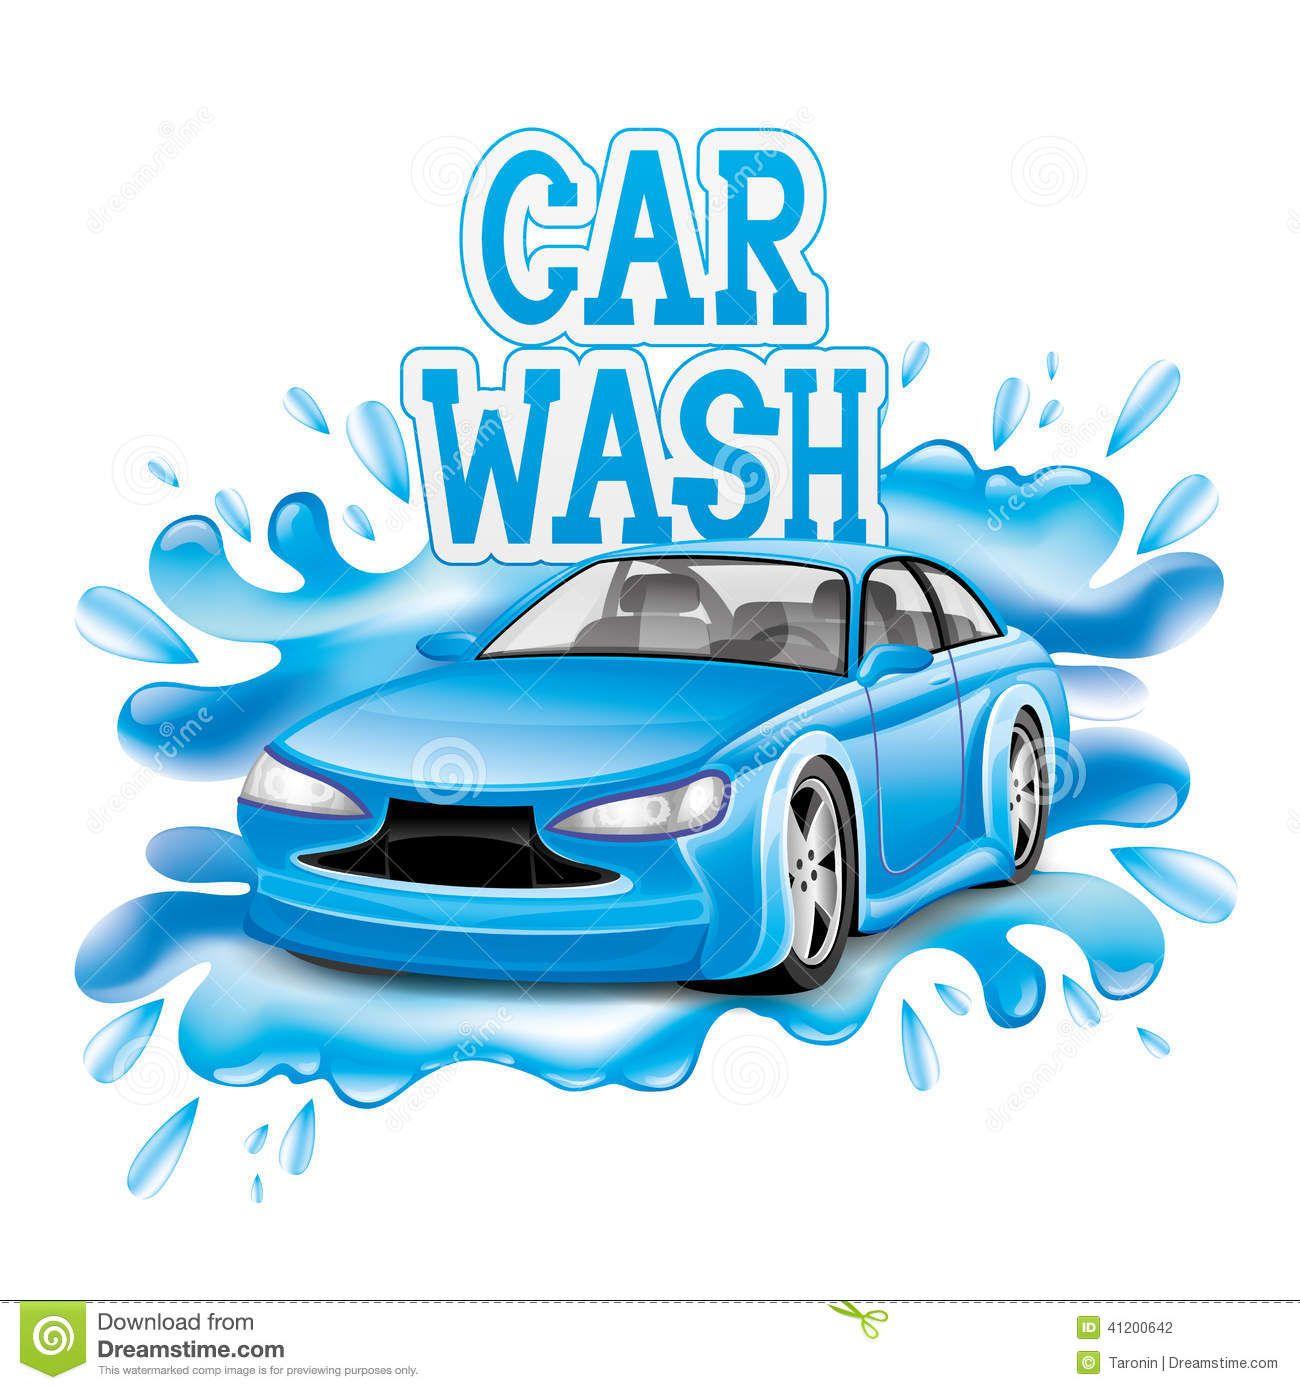 Car Wash Car Wash Car Wash Sign Car Wash Posters